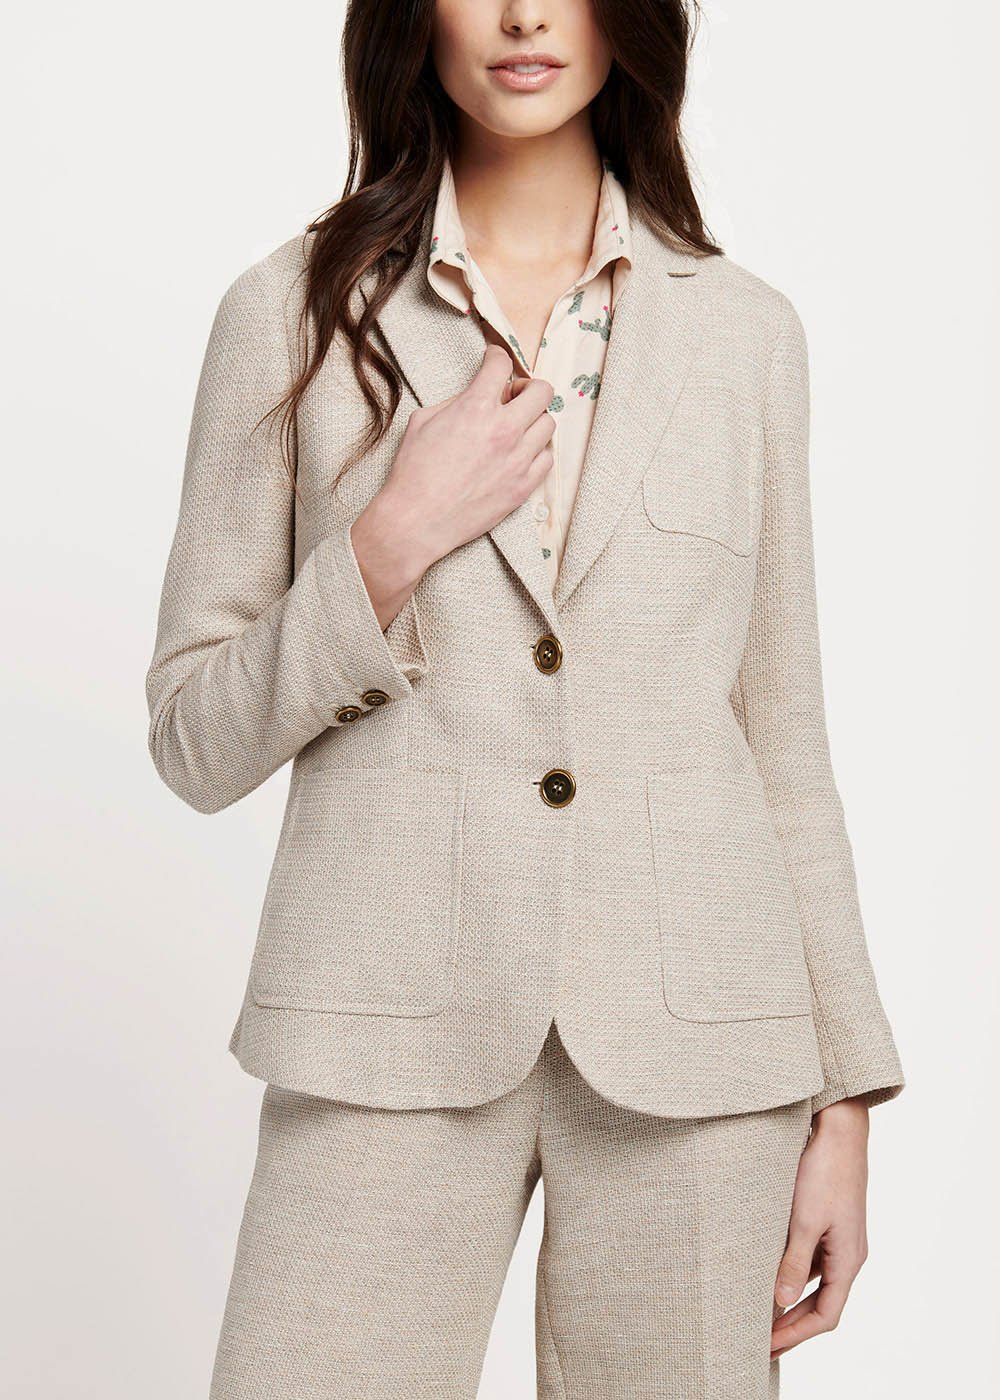 Kelly jacket with rush matting effect - Light Beige - Woman